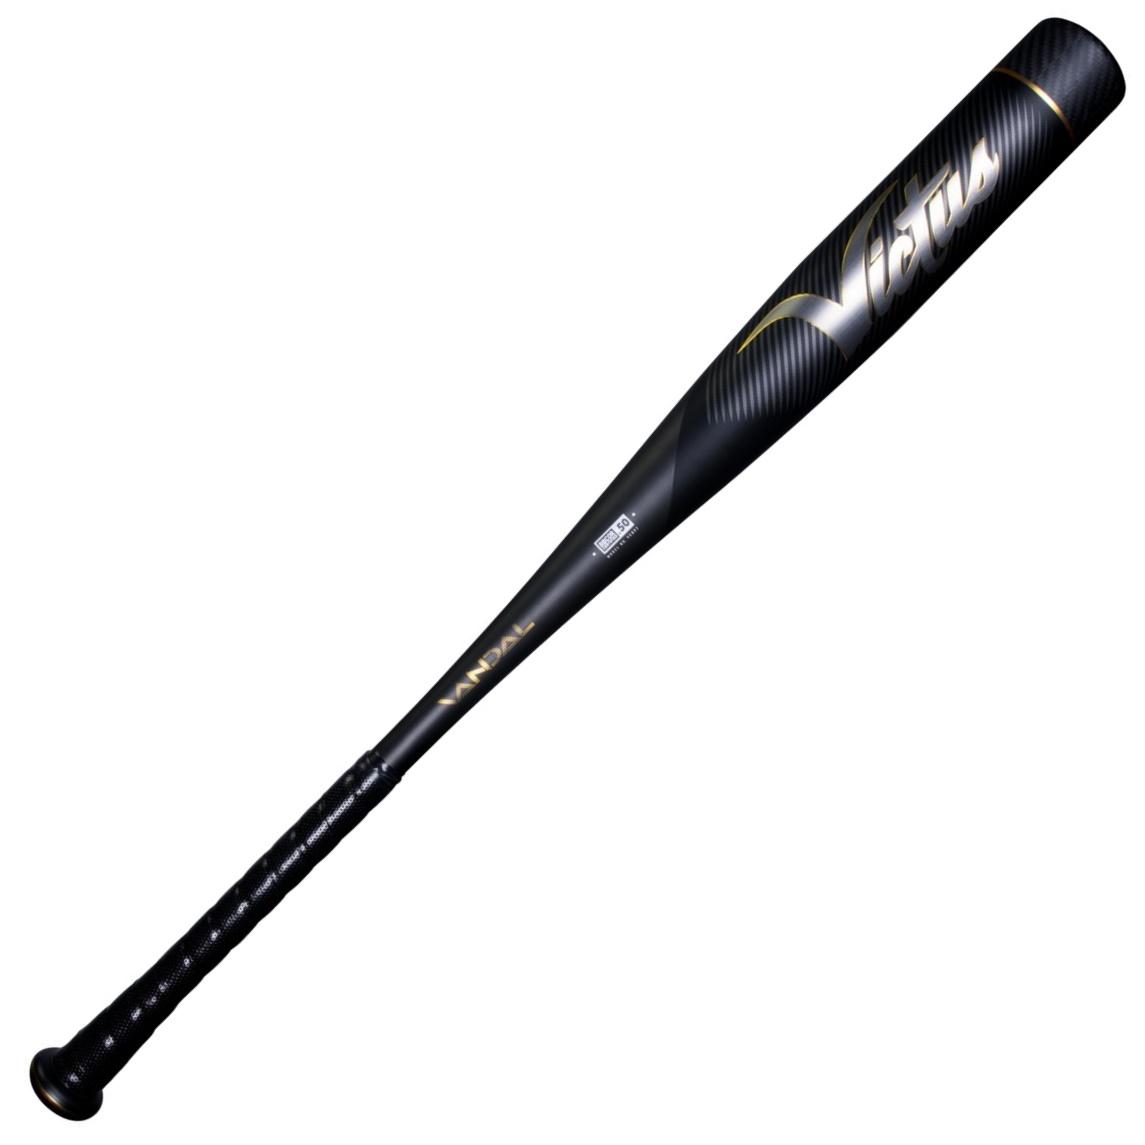 victus-vandal-2-10-baseball-bat-31-inch-21-oz VSBV2X10-3121   <ul class=a-unordered-list a-vertical a-spacing-mini> <li><span class=a-list-item>Ringless barrel design made of multi-variable